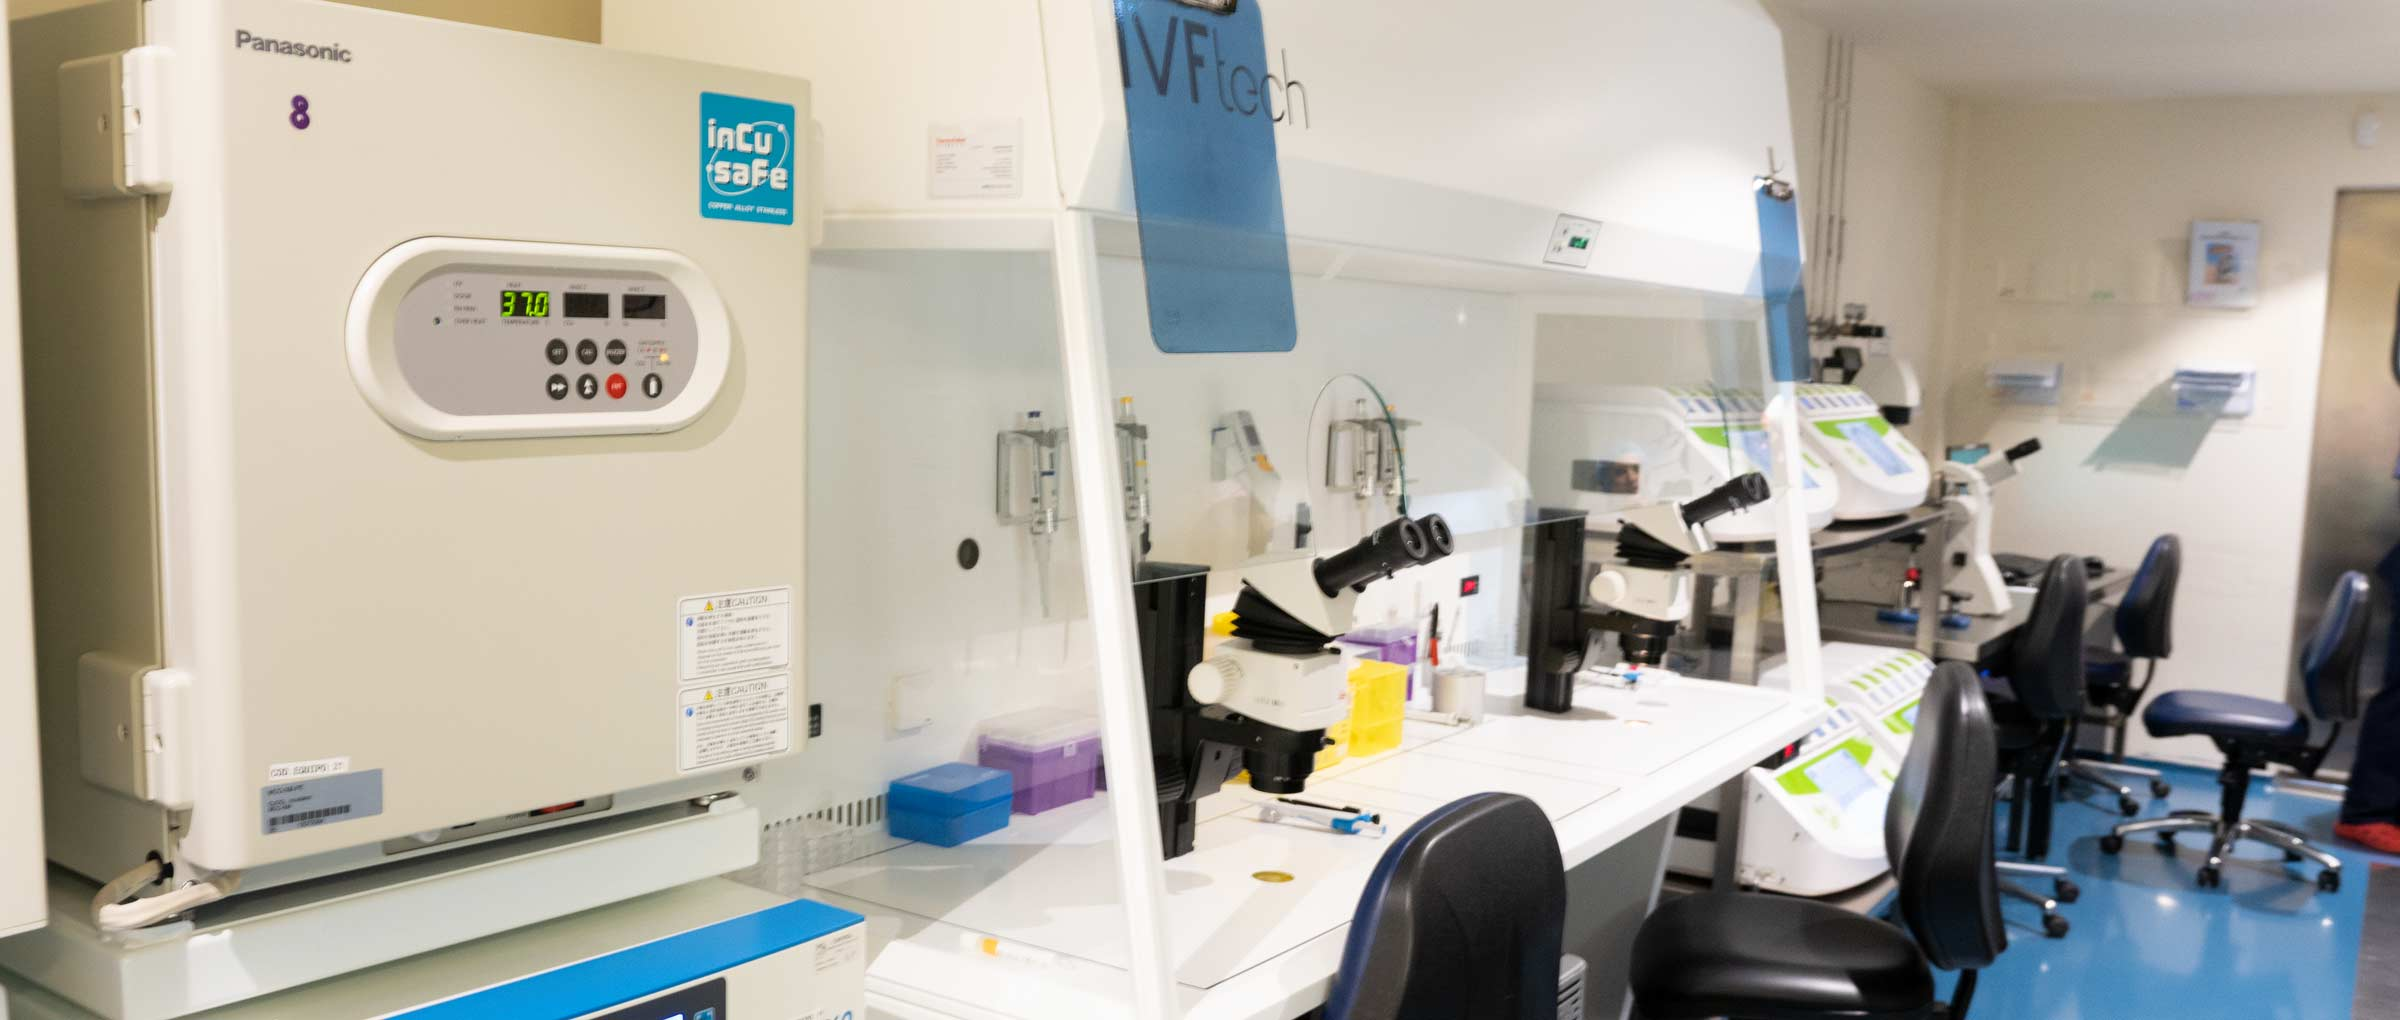 Laboratorio de IVF-Spain